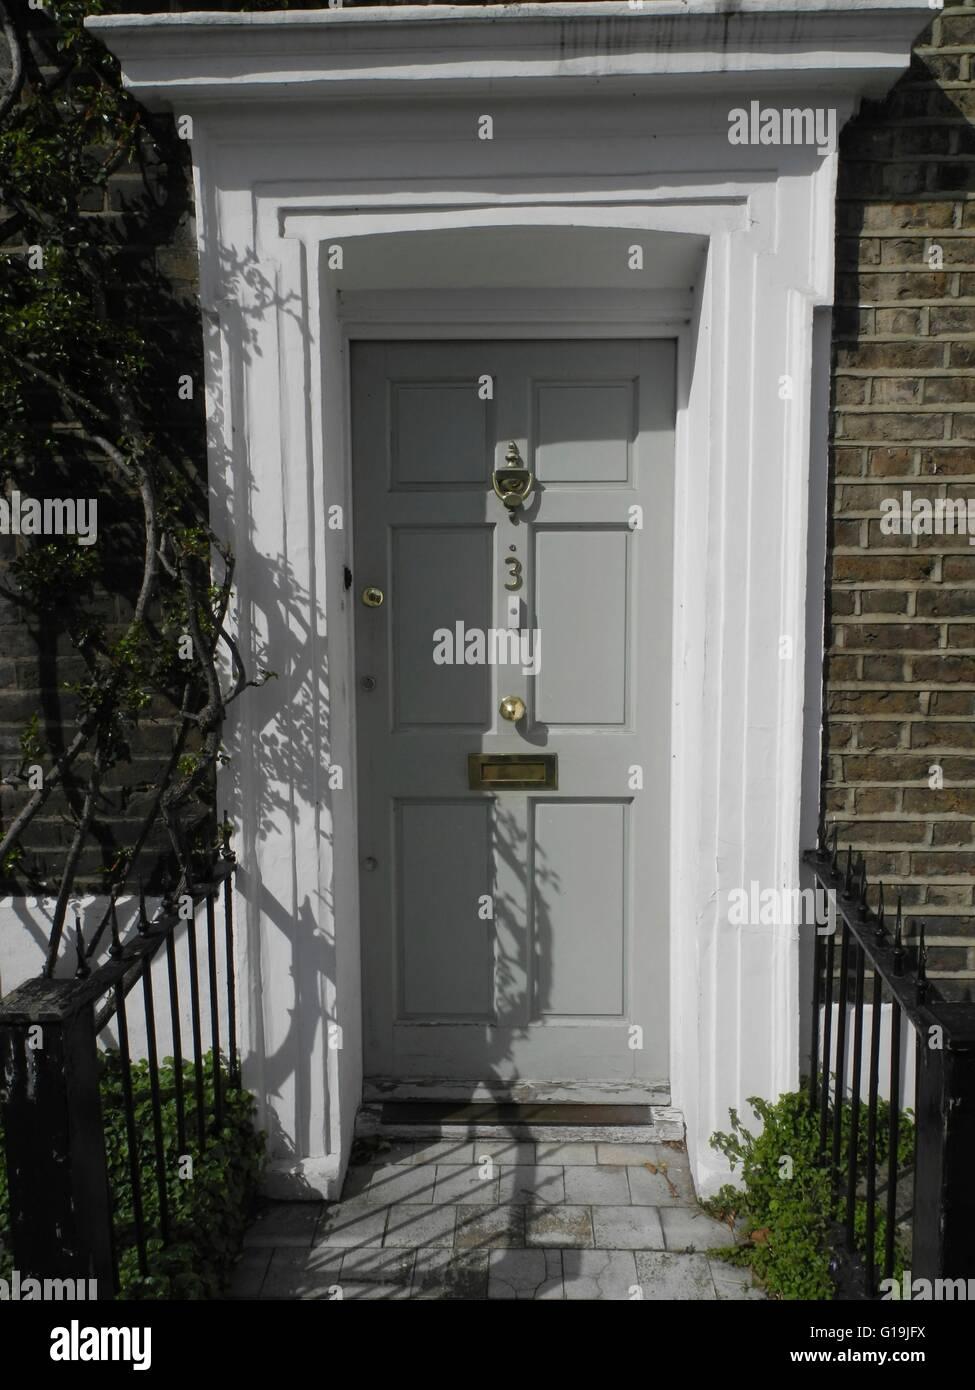 Elegant Front Doors. Elegant Solid Wood Entry Doors Model Front ...